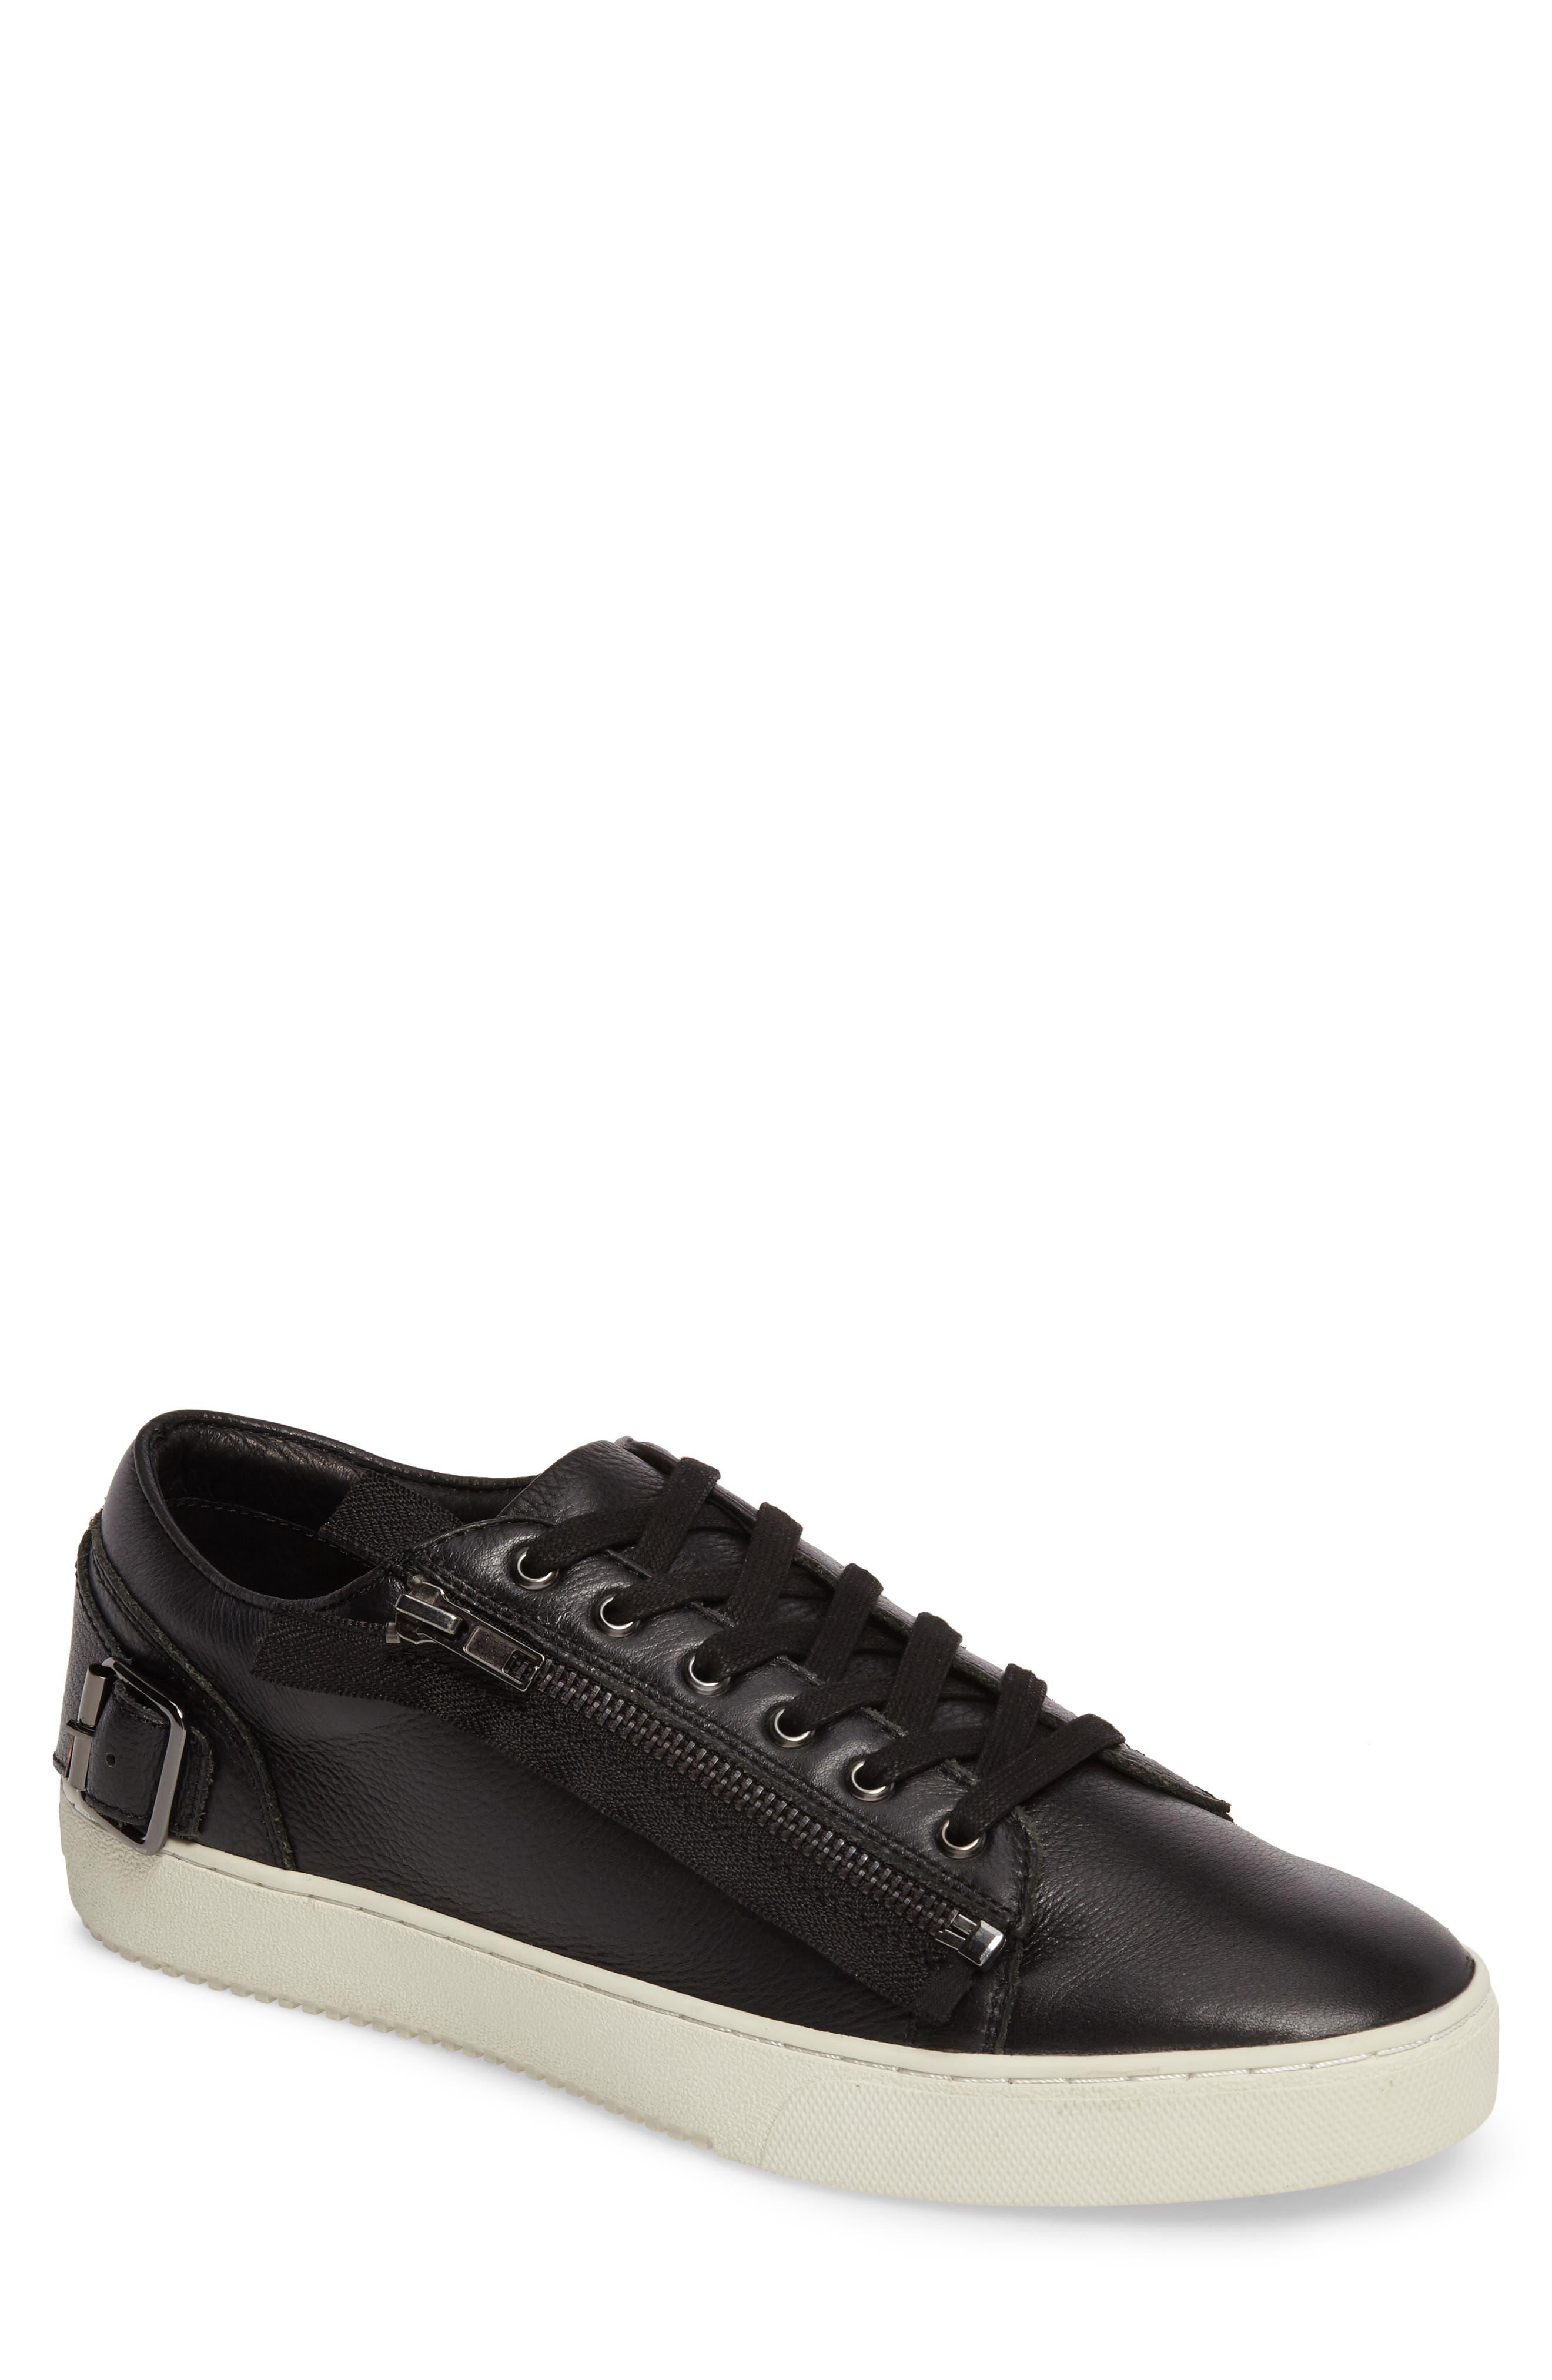 Wayne Sneaker,                         Main,                         color, BLACK LEATHER